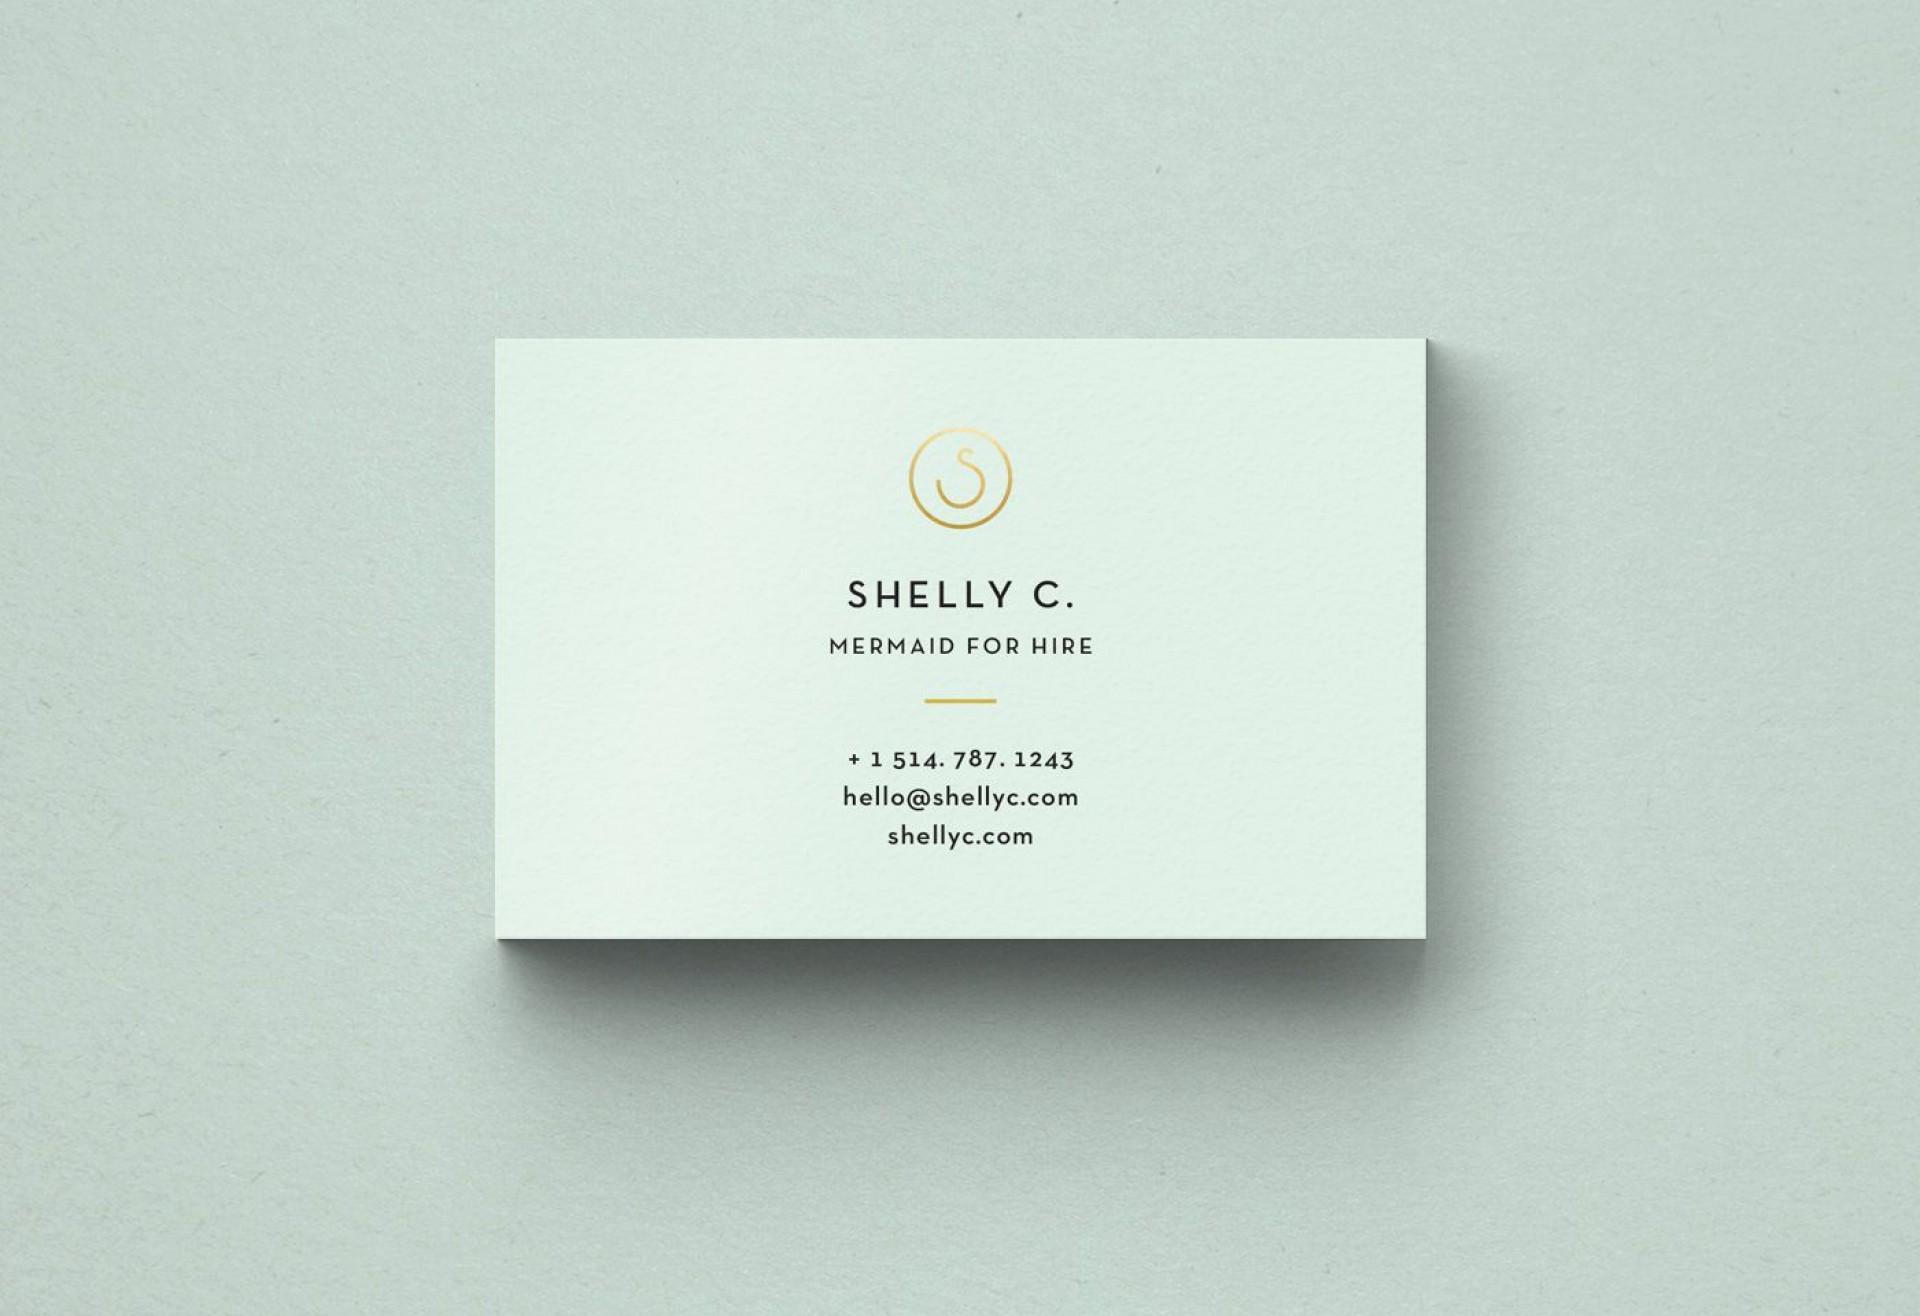 002 Breathtaking Minimal Busines Card Template Free Download Concept  Simple Design Coreldraw1920